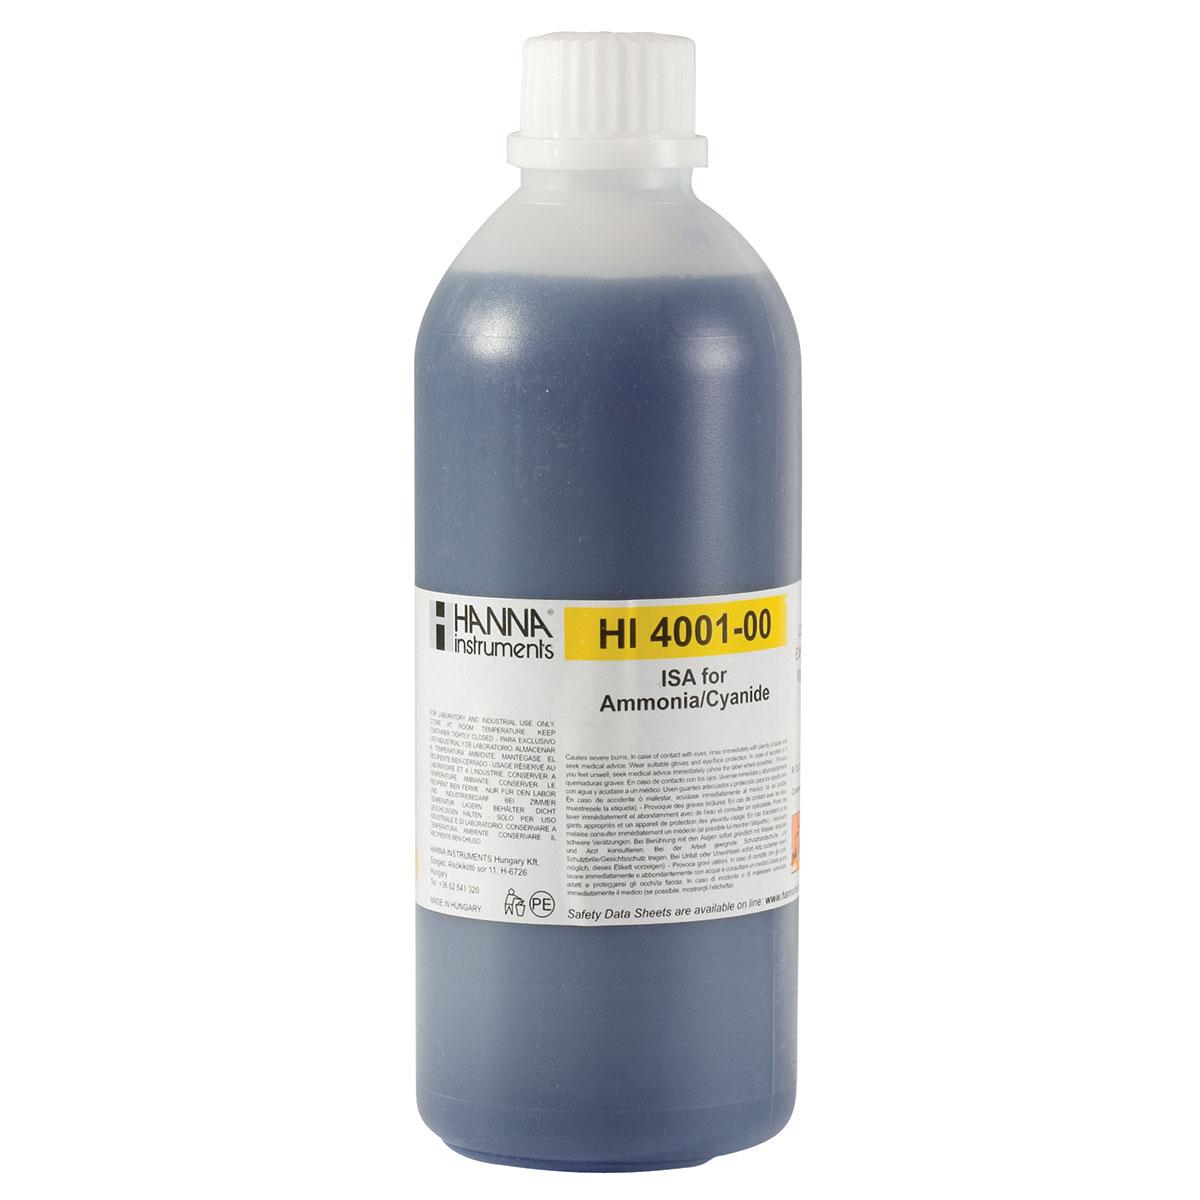 HI4001-00 Alkaline Ionic Strength Adjuster (ISA) for Ammonia and Cyanide ISEs (500 mL)